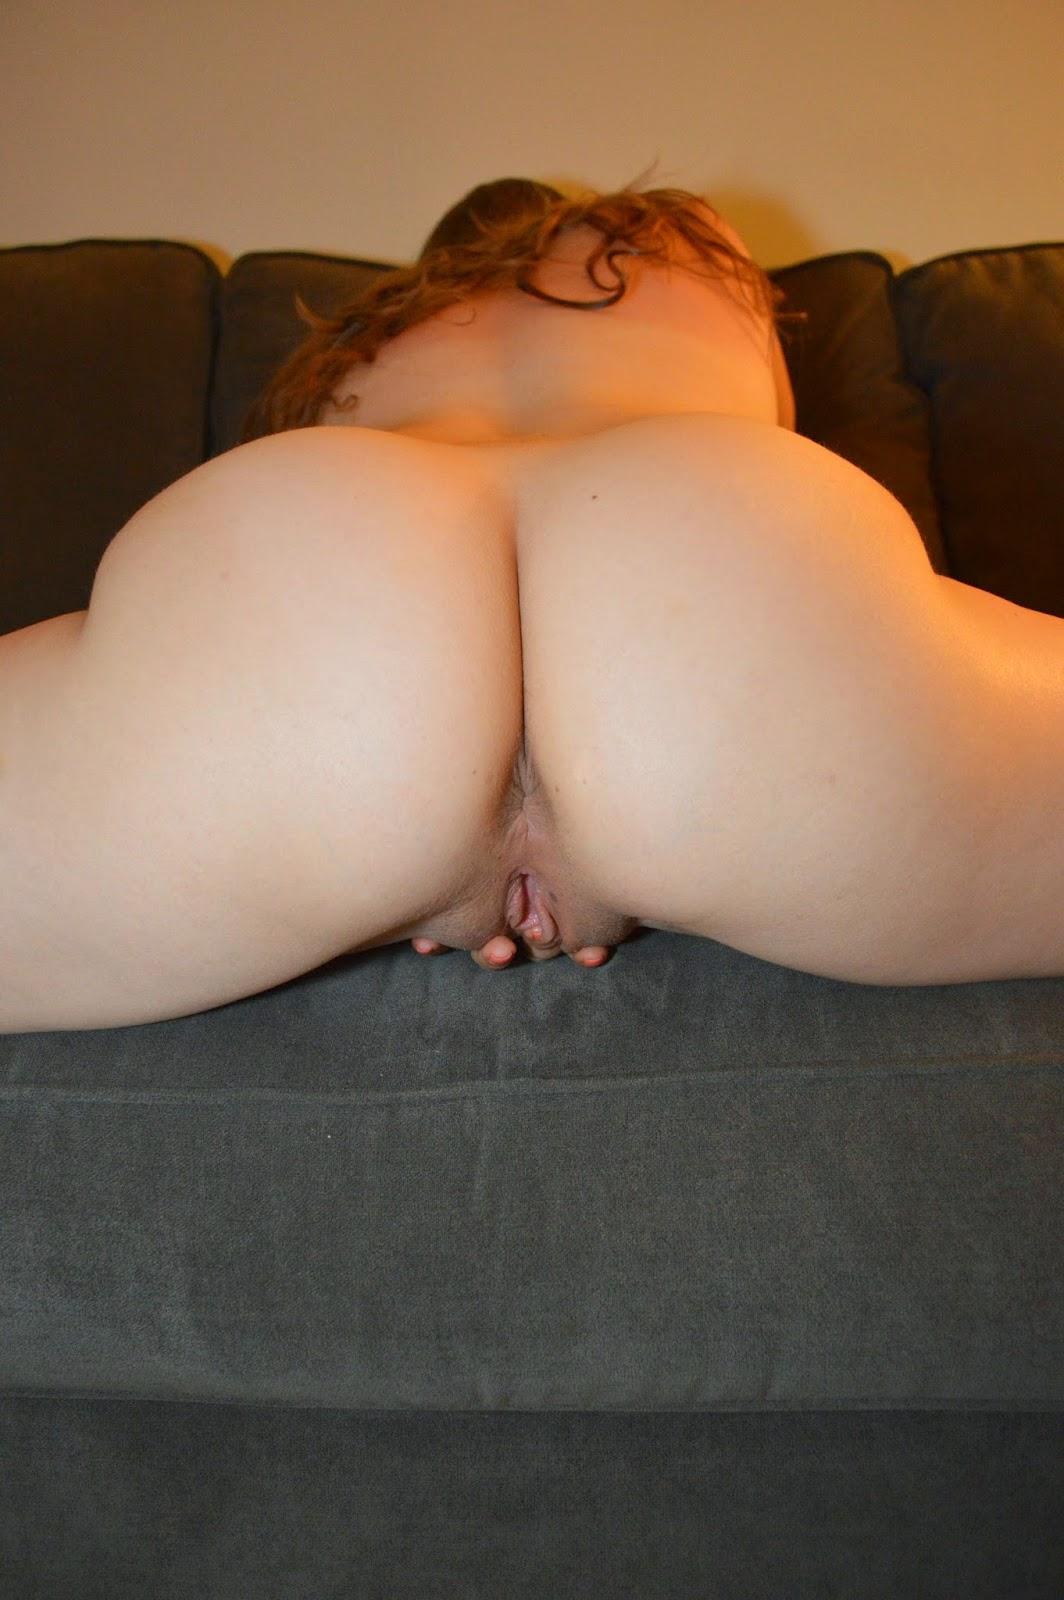 Eating Chubby Teen Pussy